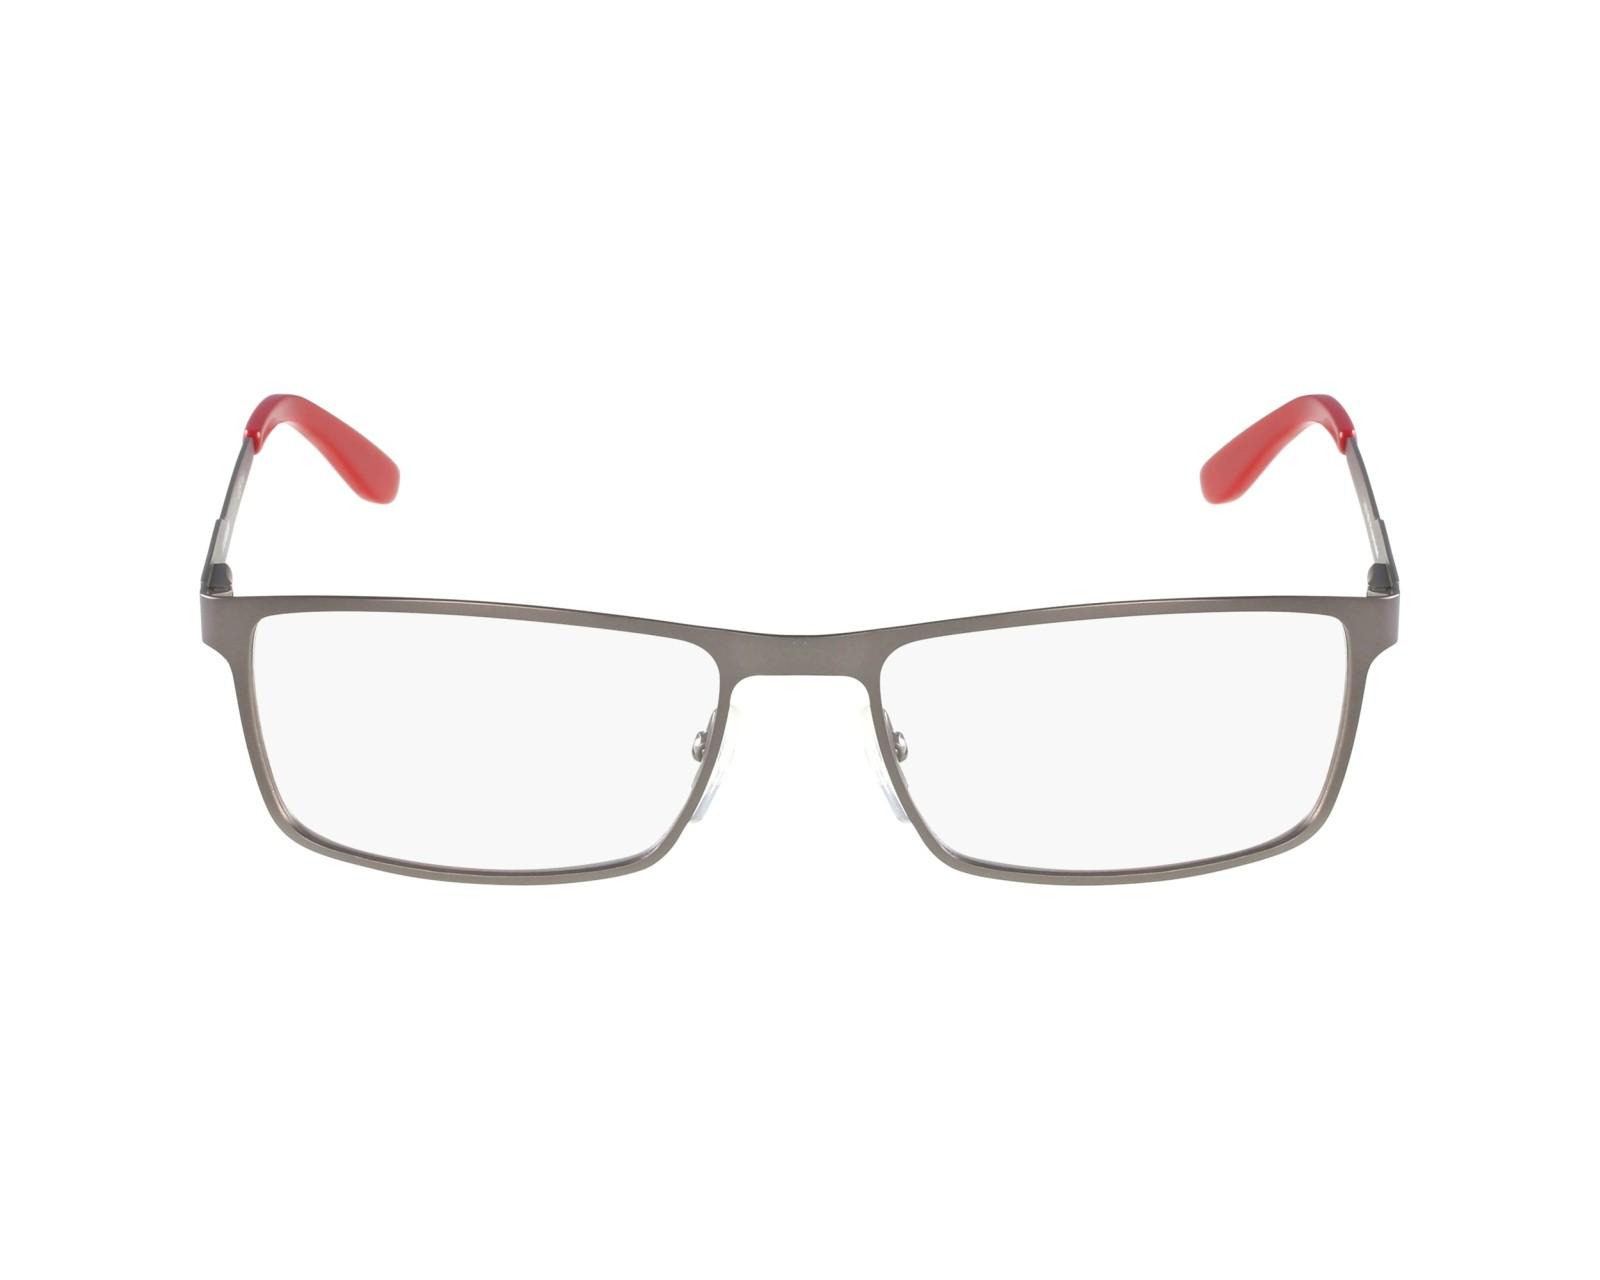 Carrera Eyeglasses Silver CA-6630 R80 - Visionet US